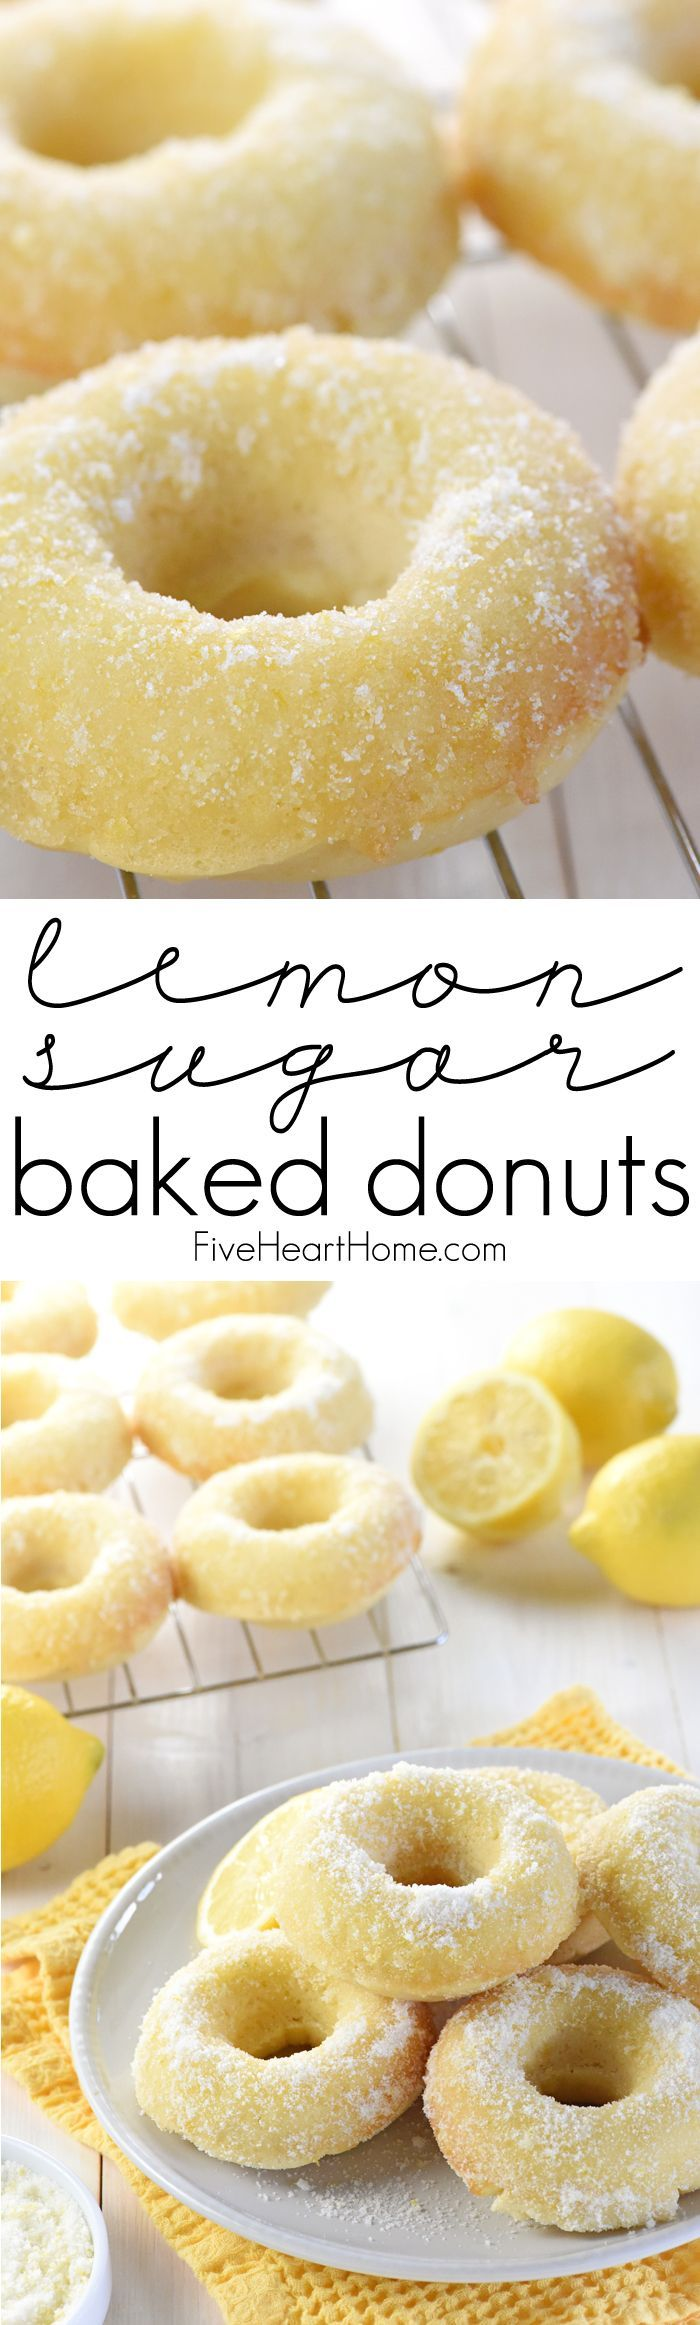 Holidays Last Minute: Lemon Sugar Baked Donuts